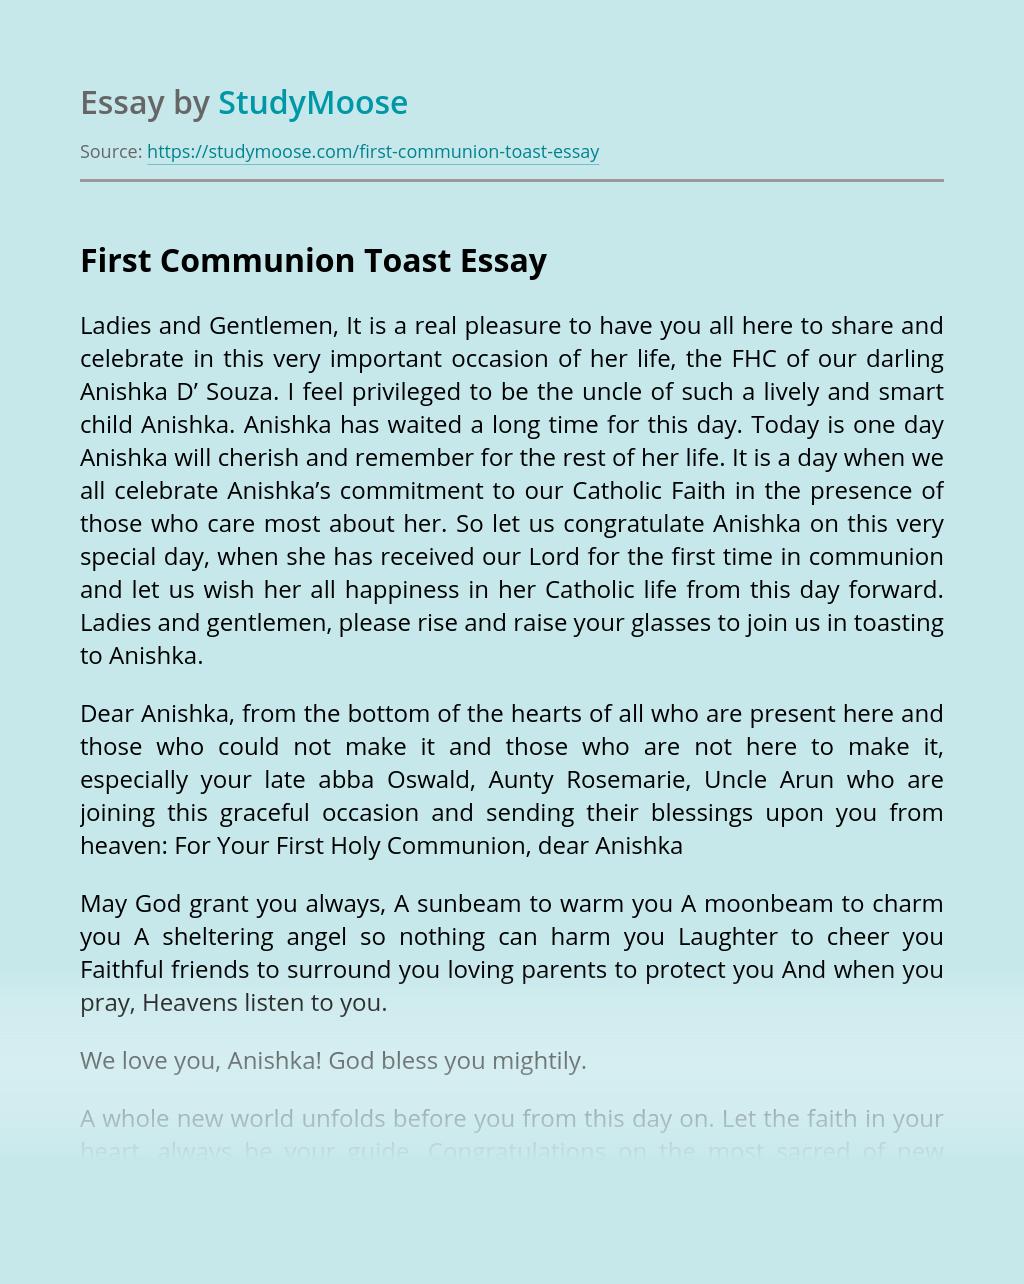 First Communion Toast